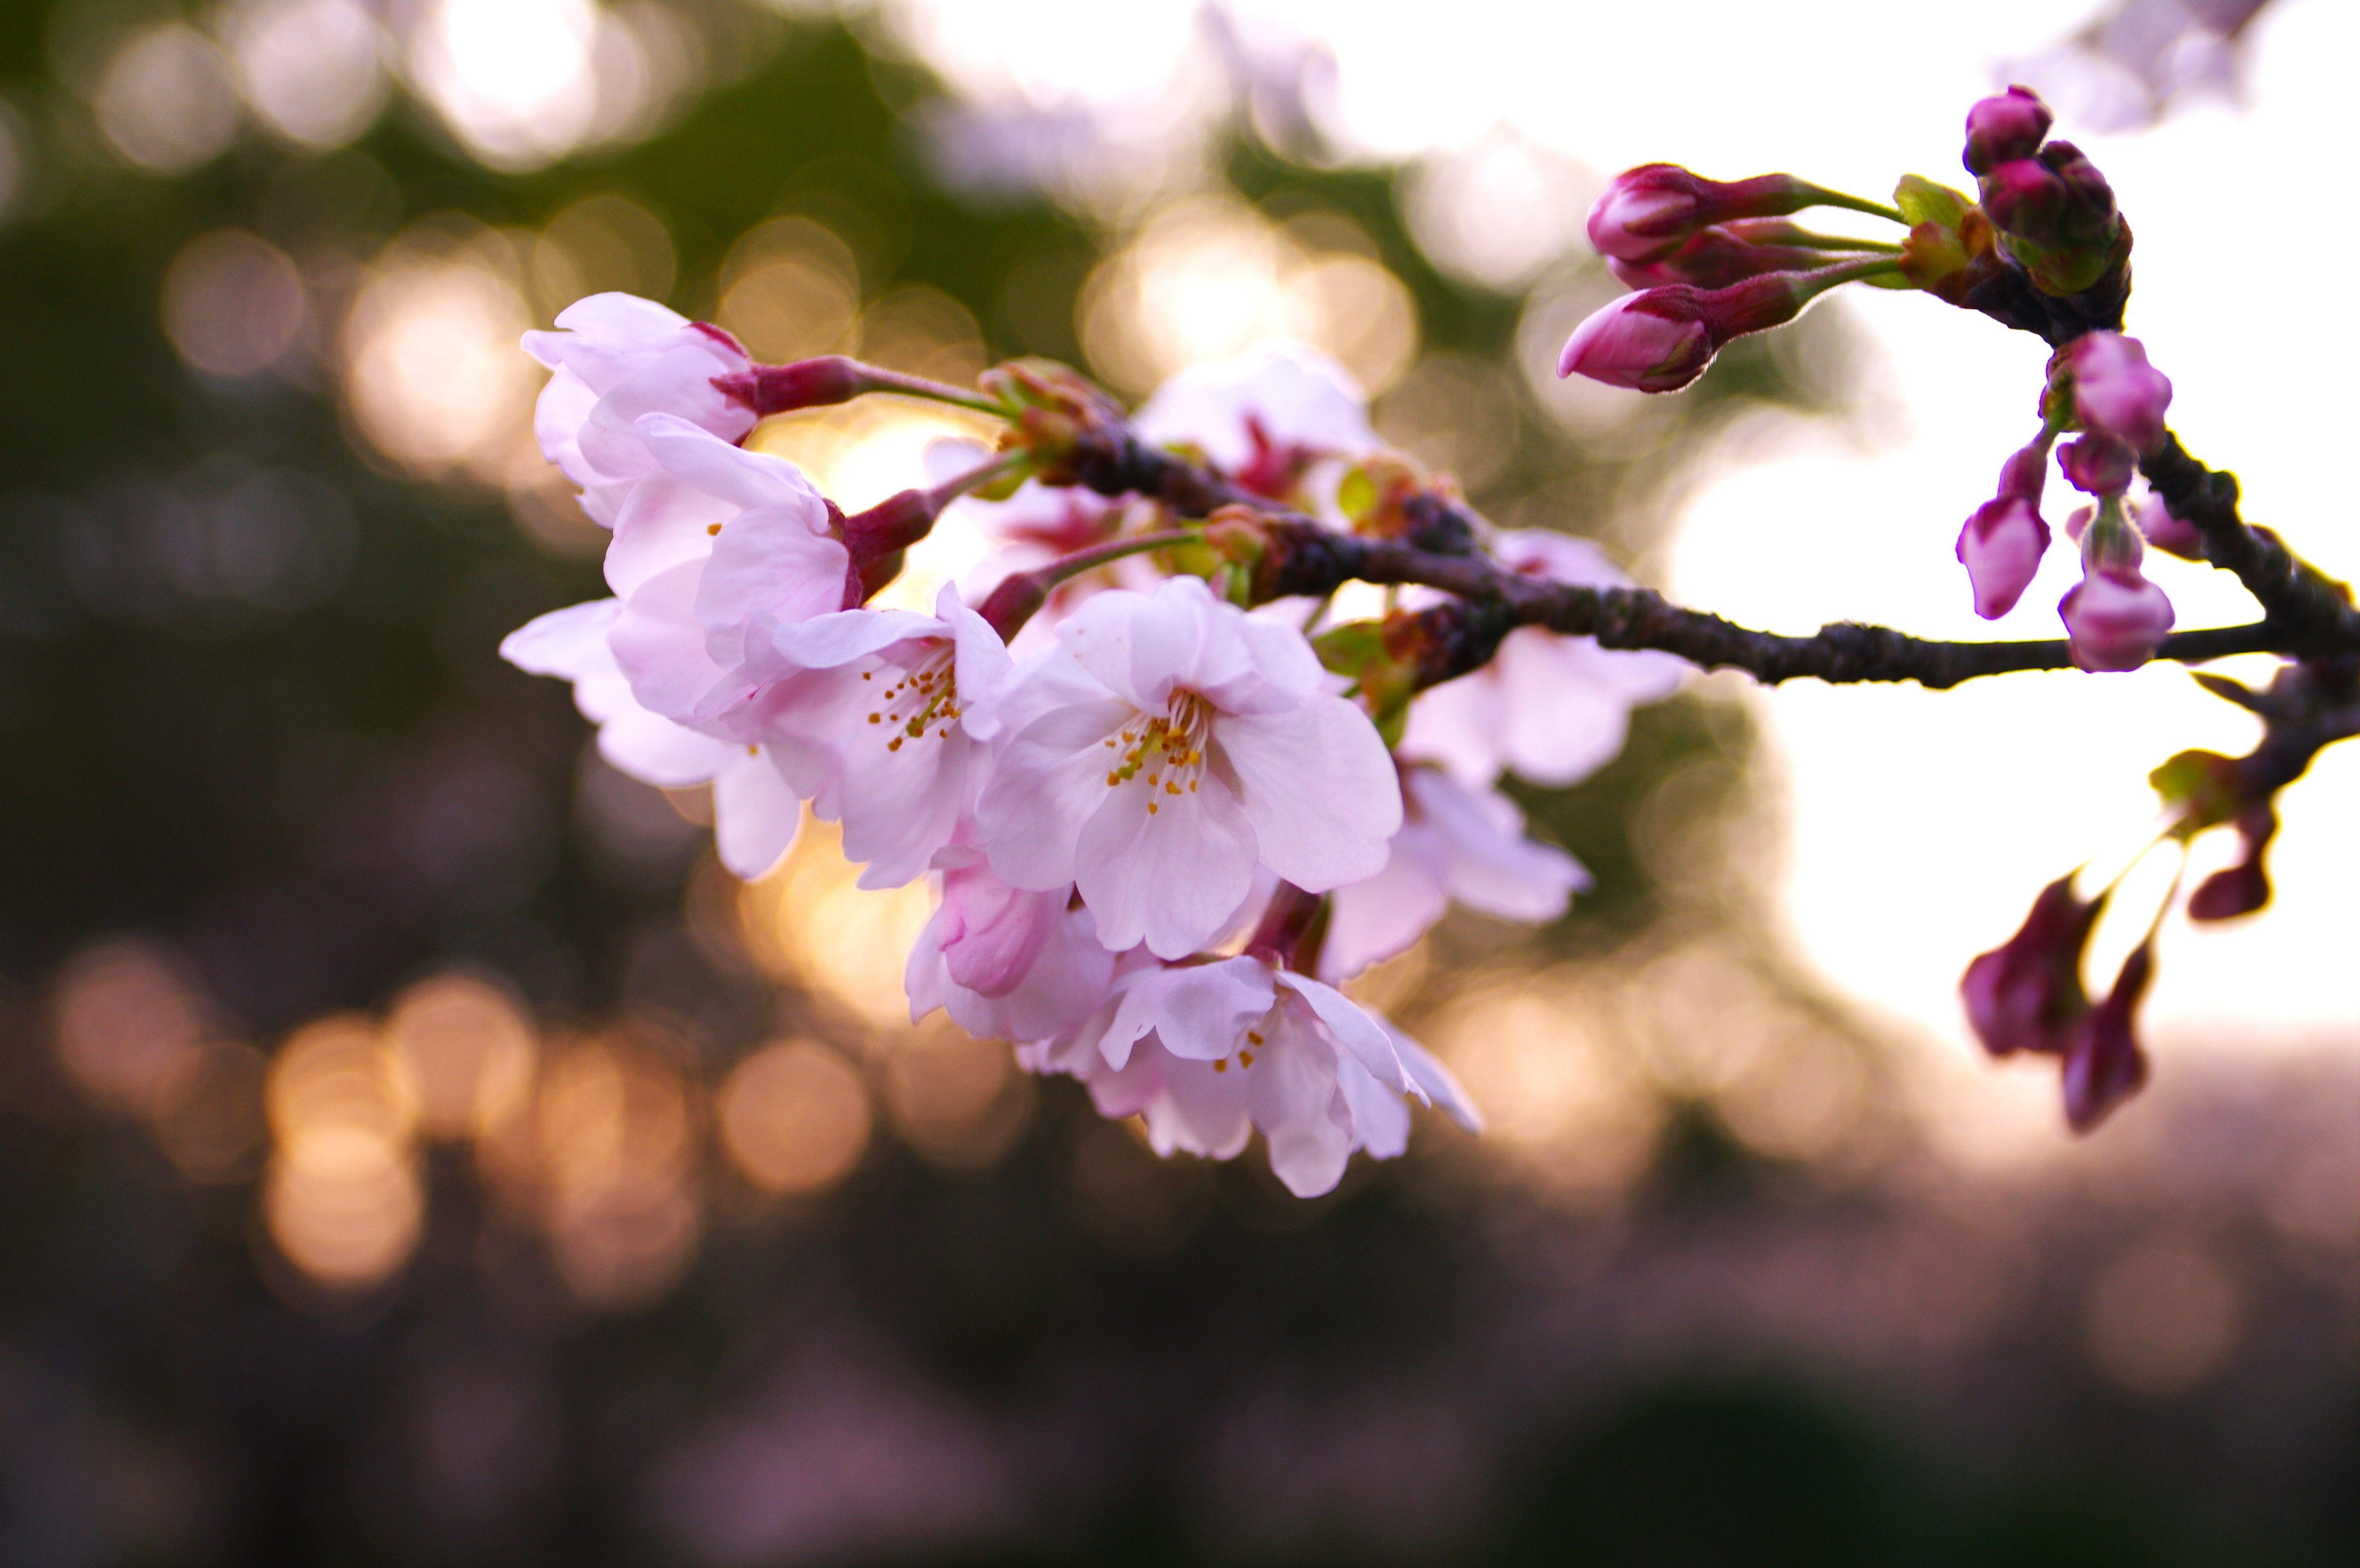 одежда цветы вишни фото картинки итоге получите яркое